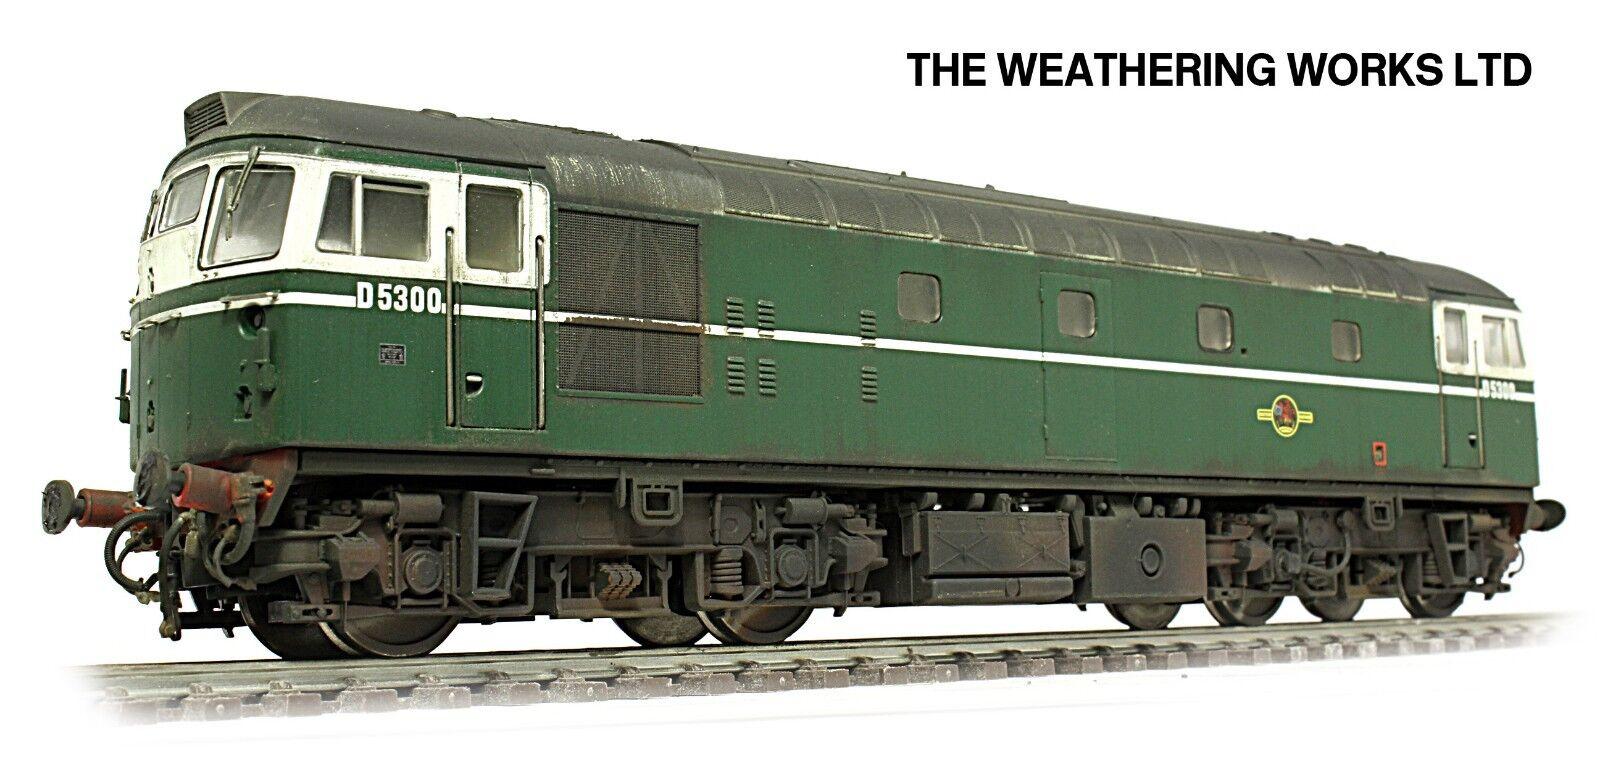 scatolaed Heljan BR verde classe 26 D5300 PRO WEATHErosso guarda DCC Ready